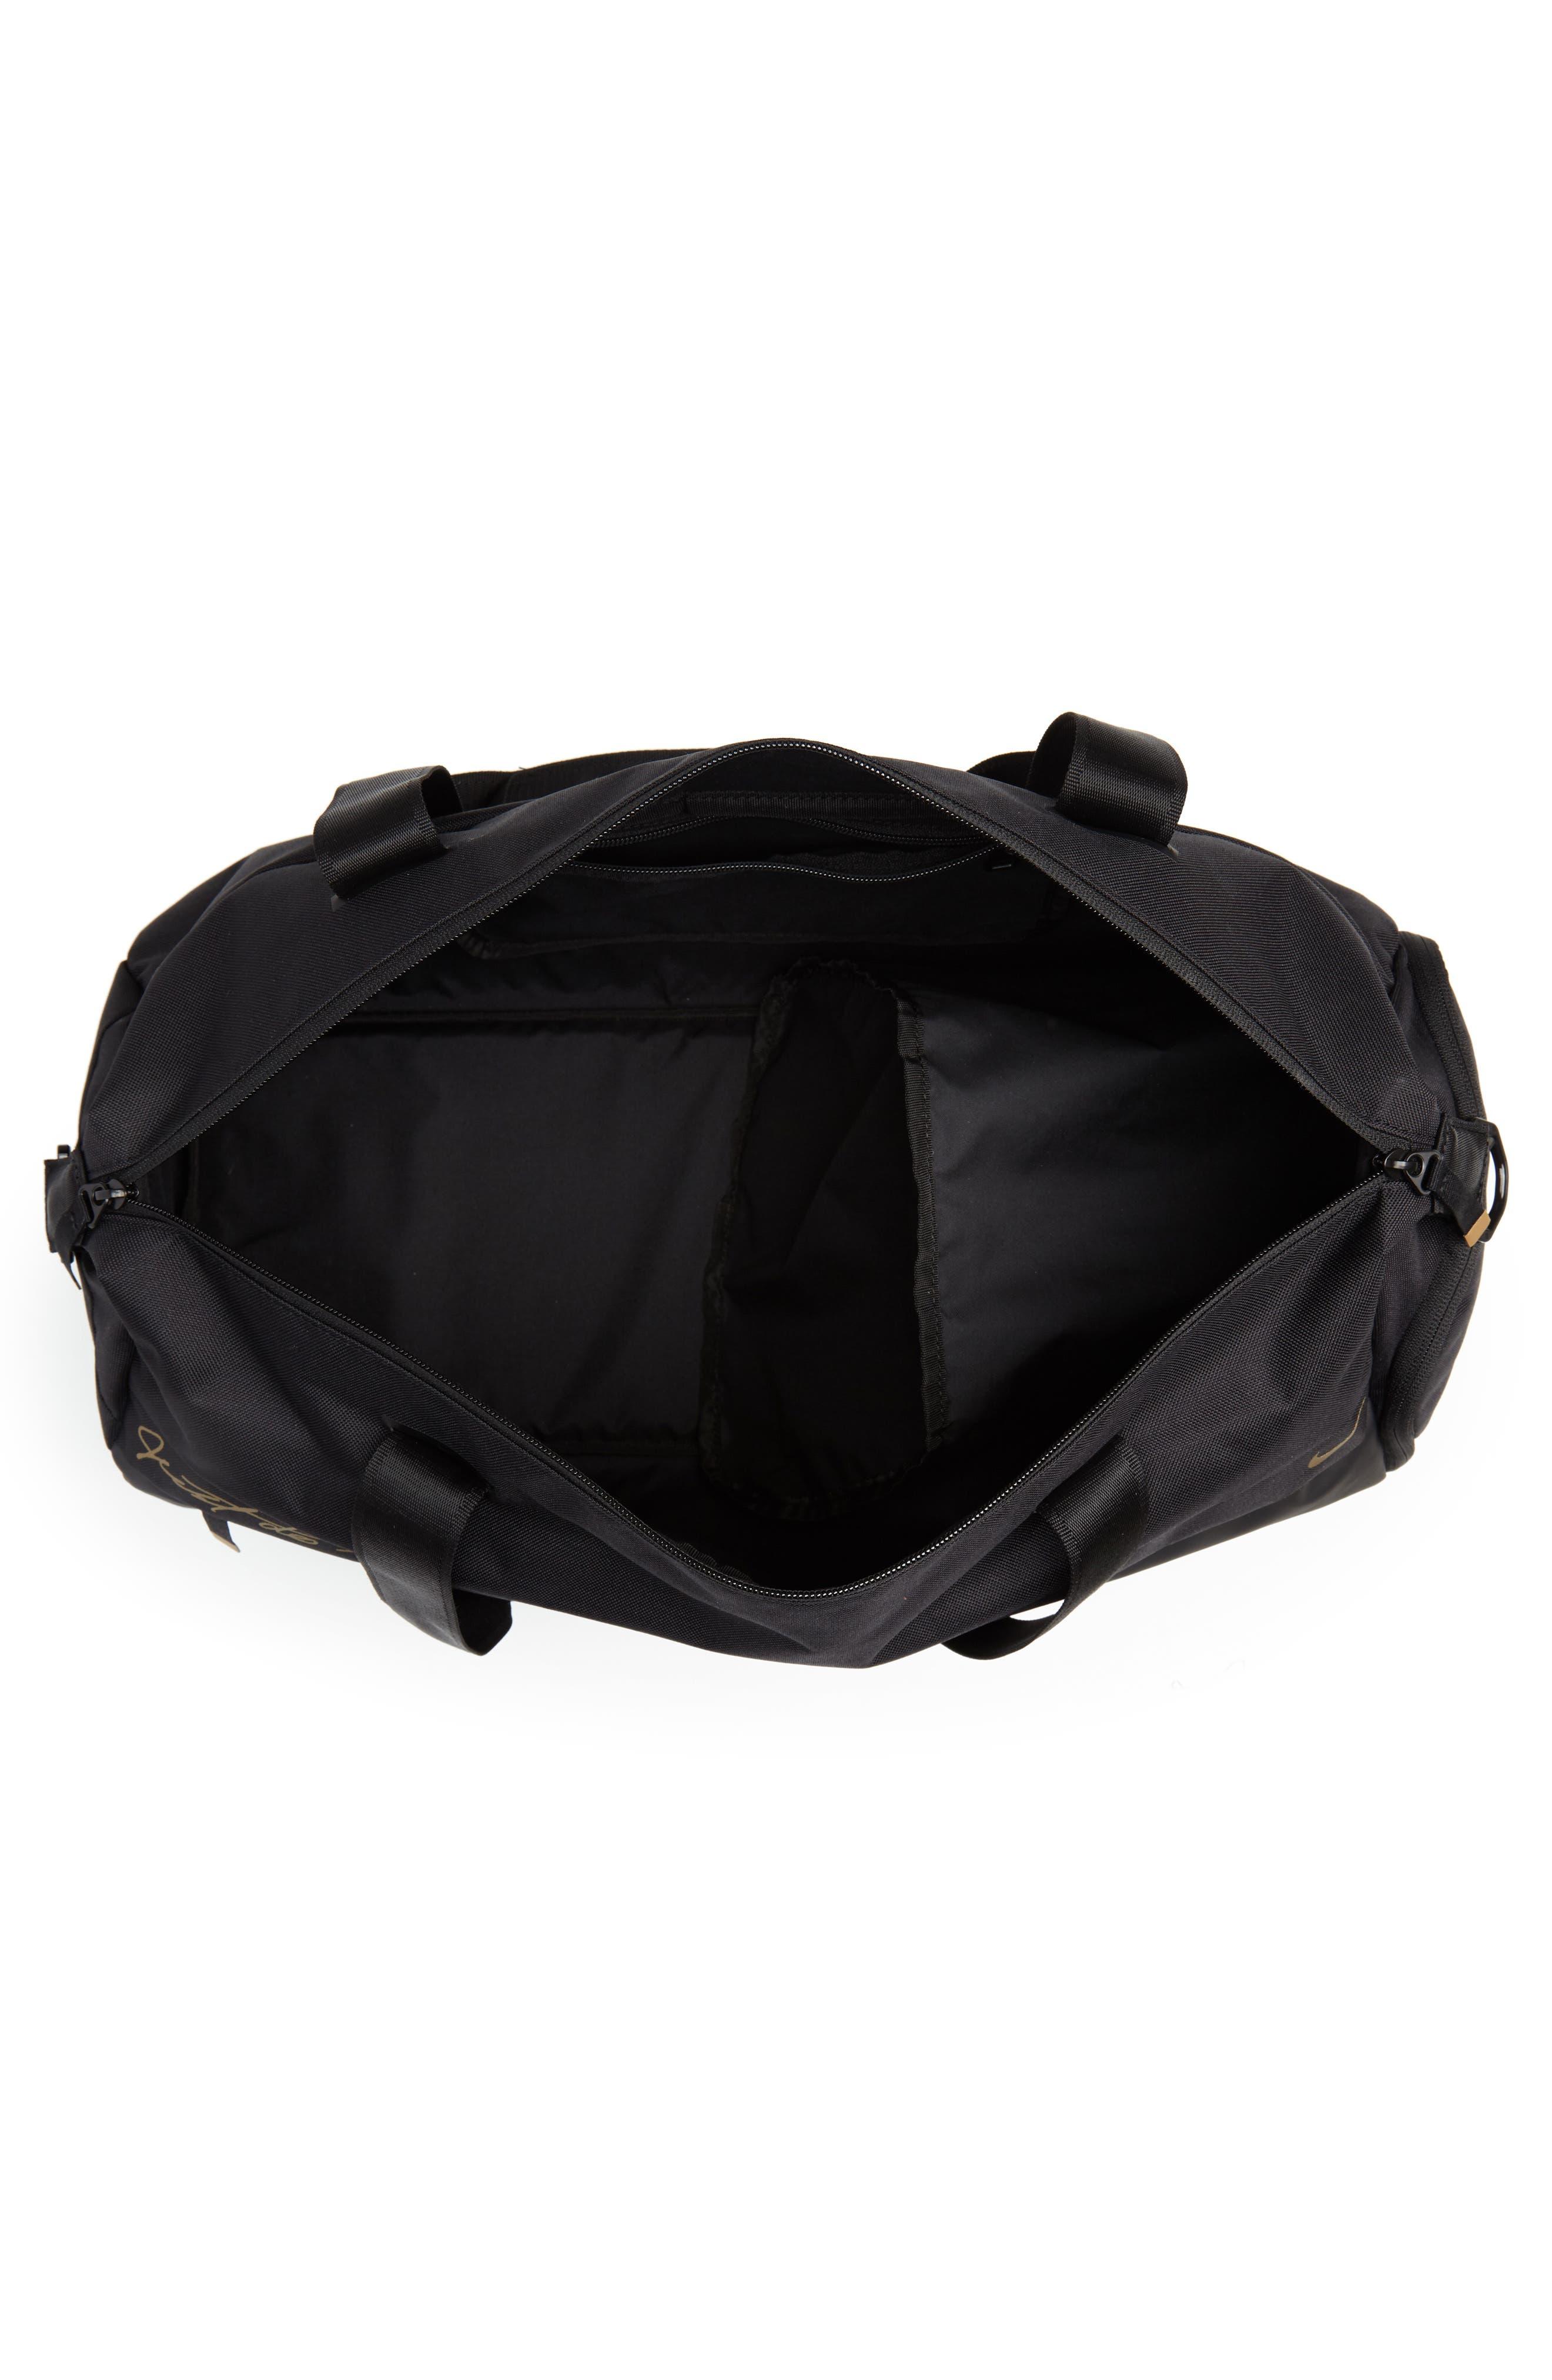 Radiate Club Training Bag,                             Alternate thumbnail 4, color,                             BLACK/ BLACK/ METALLIC GOLD